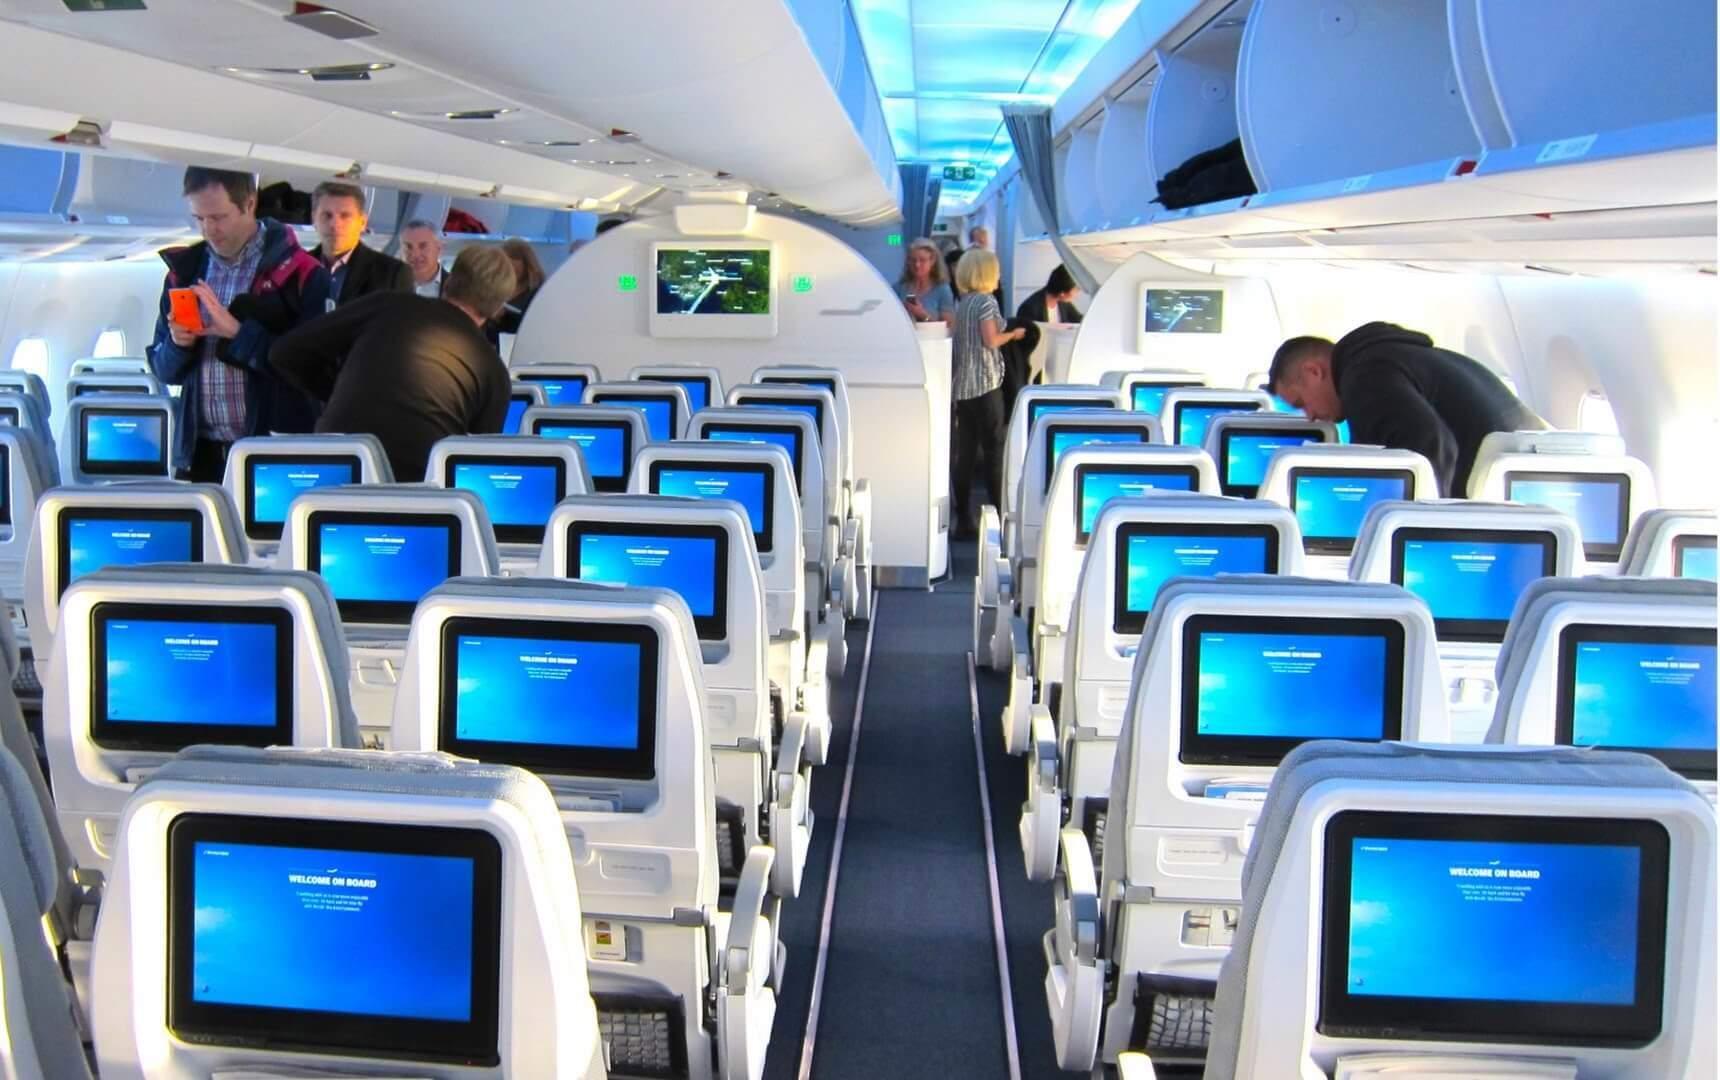 Finnair Economy Class